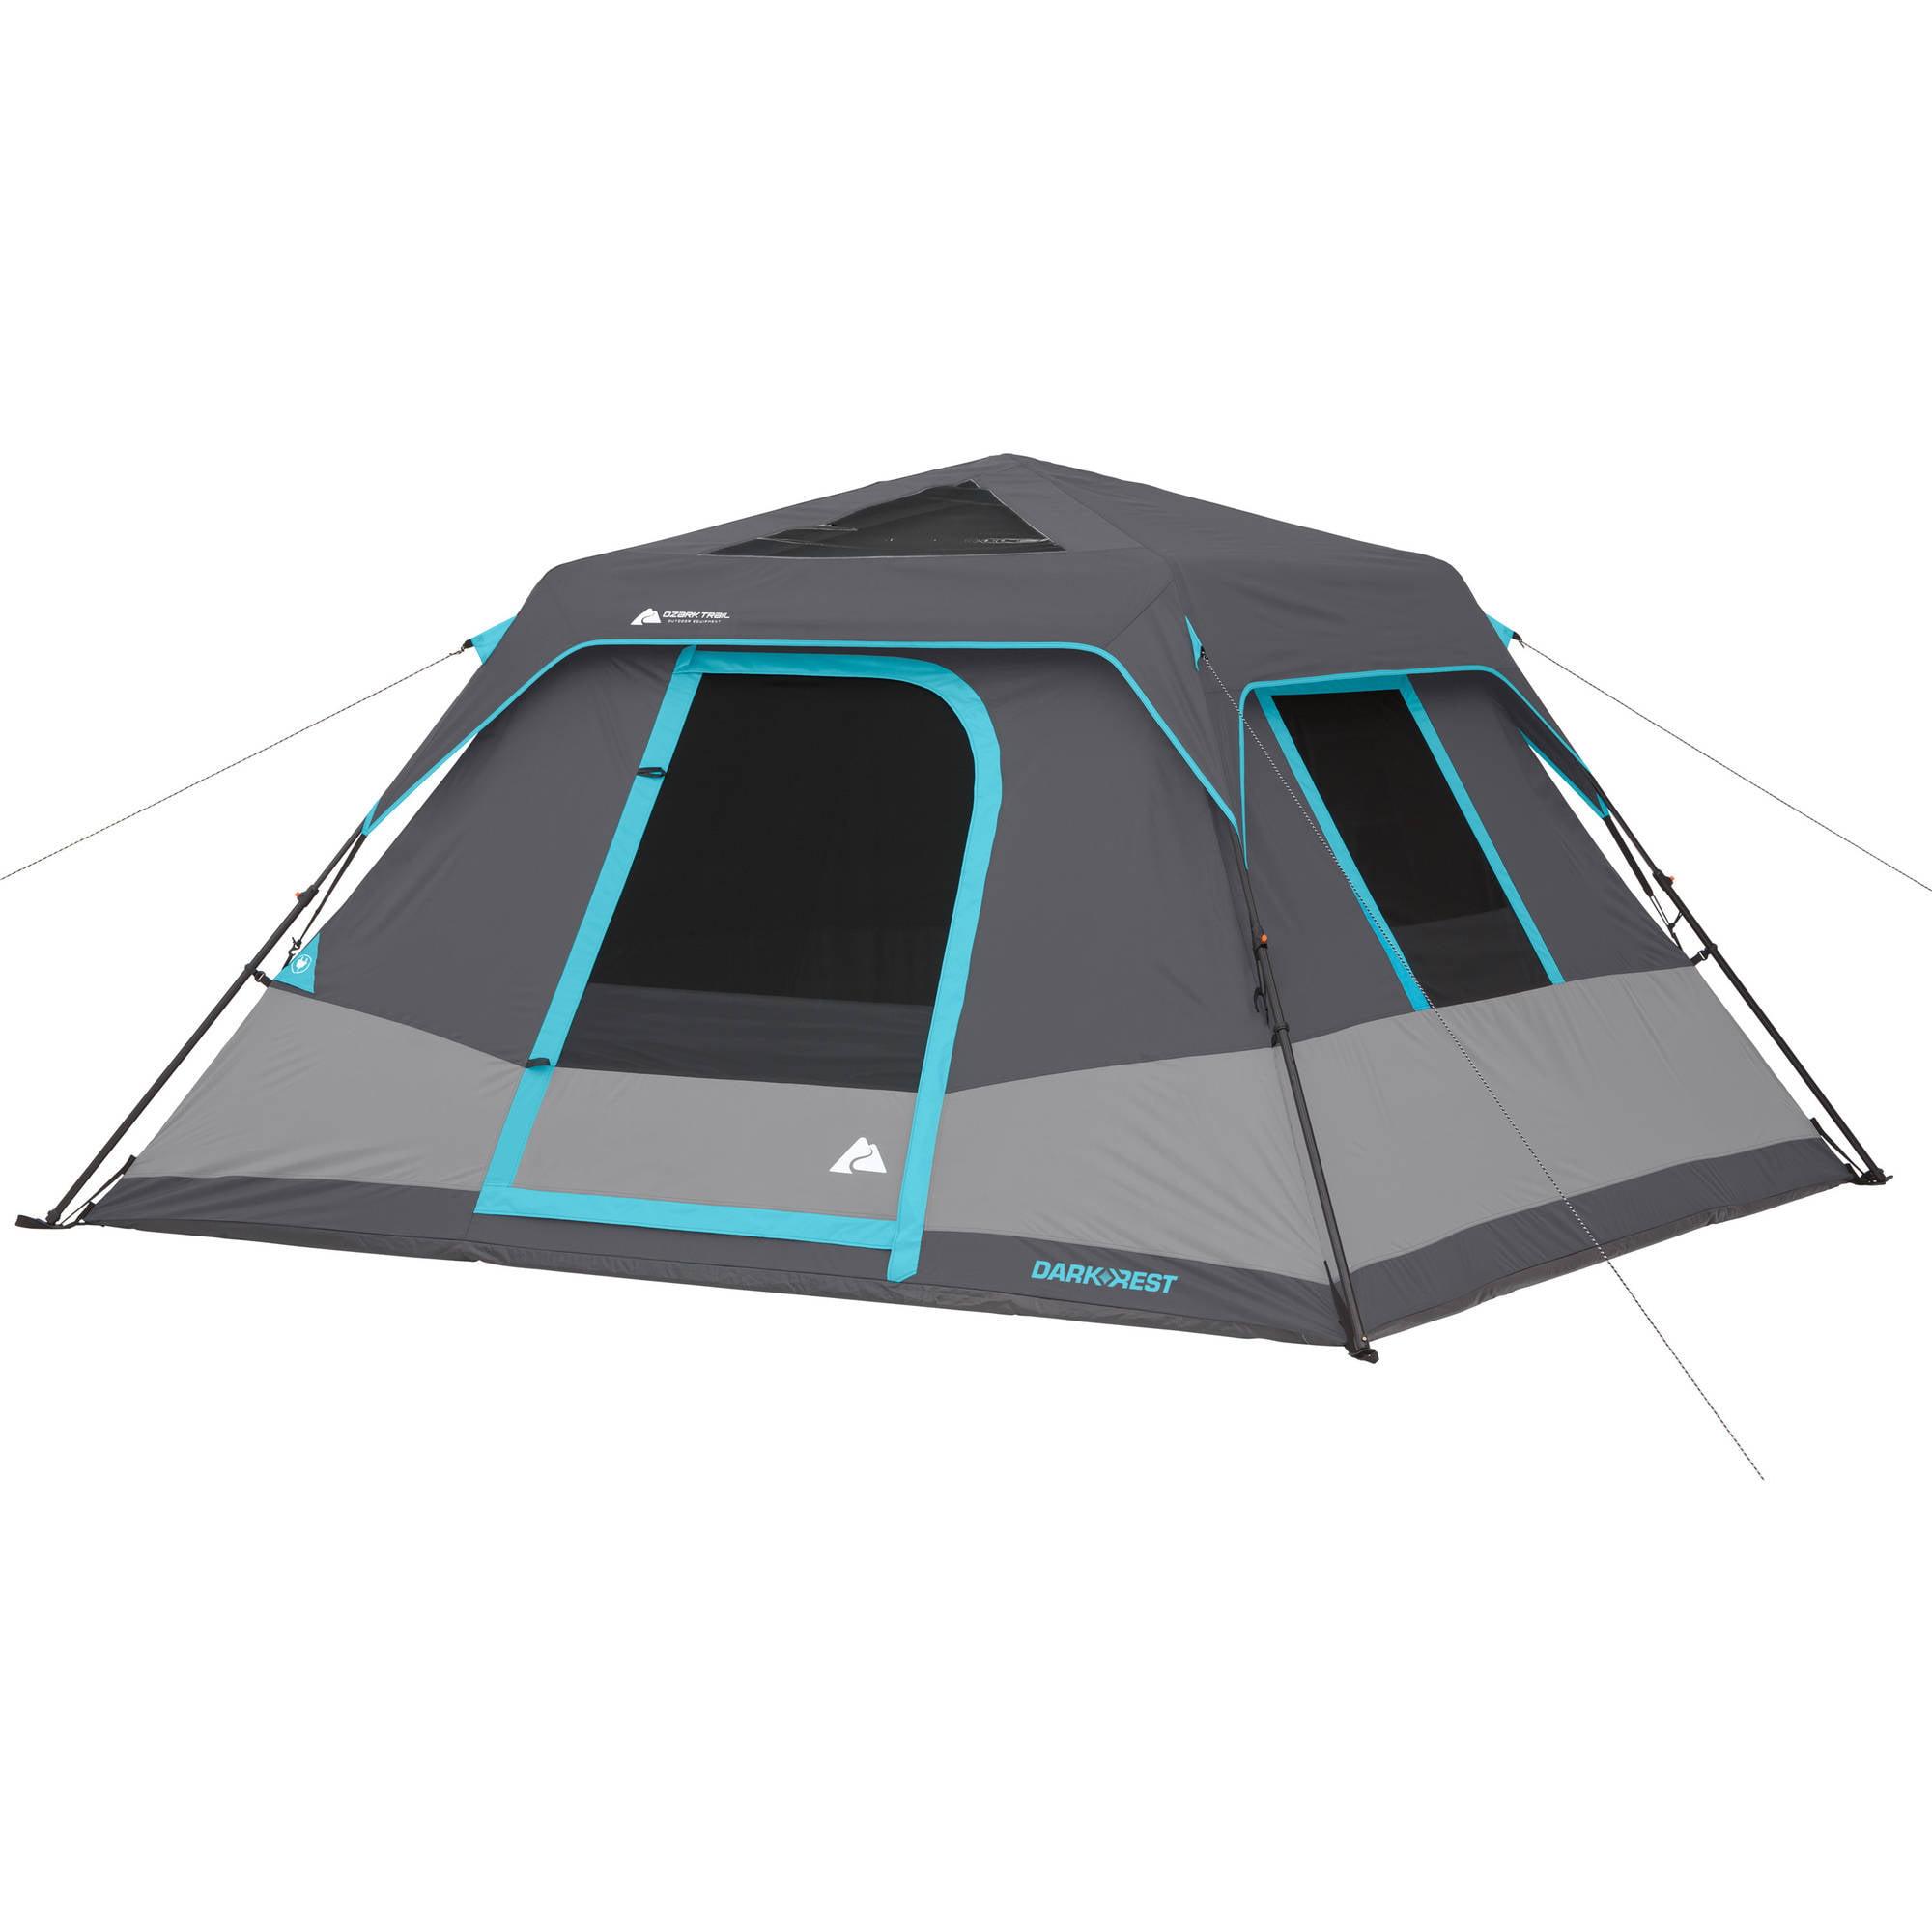 sc 1 st  Walmart & Ozark Trail 6-Person Dark Rest Instant Cabin Tent - Walmart.com